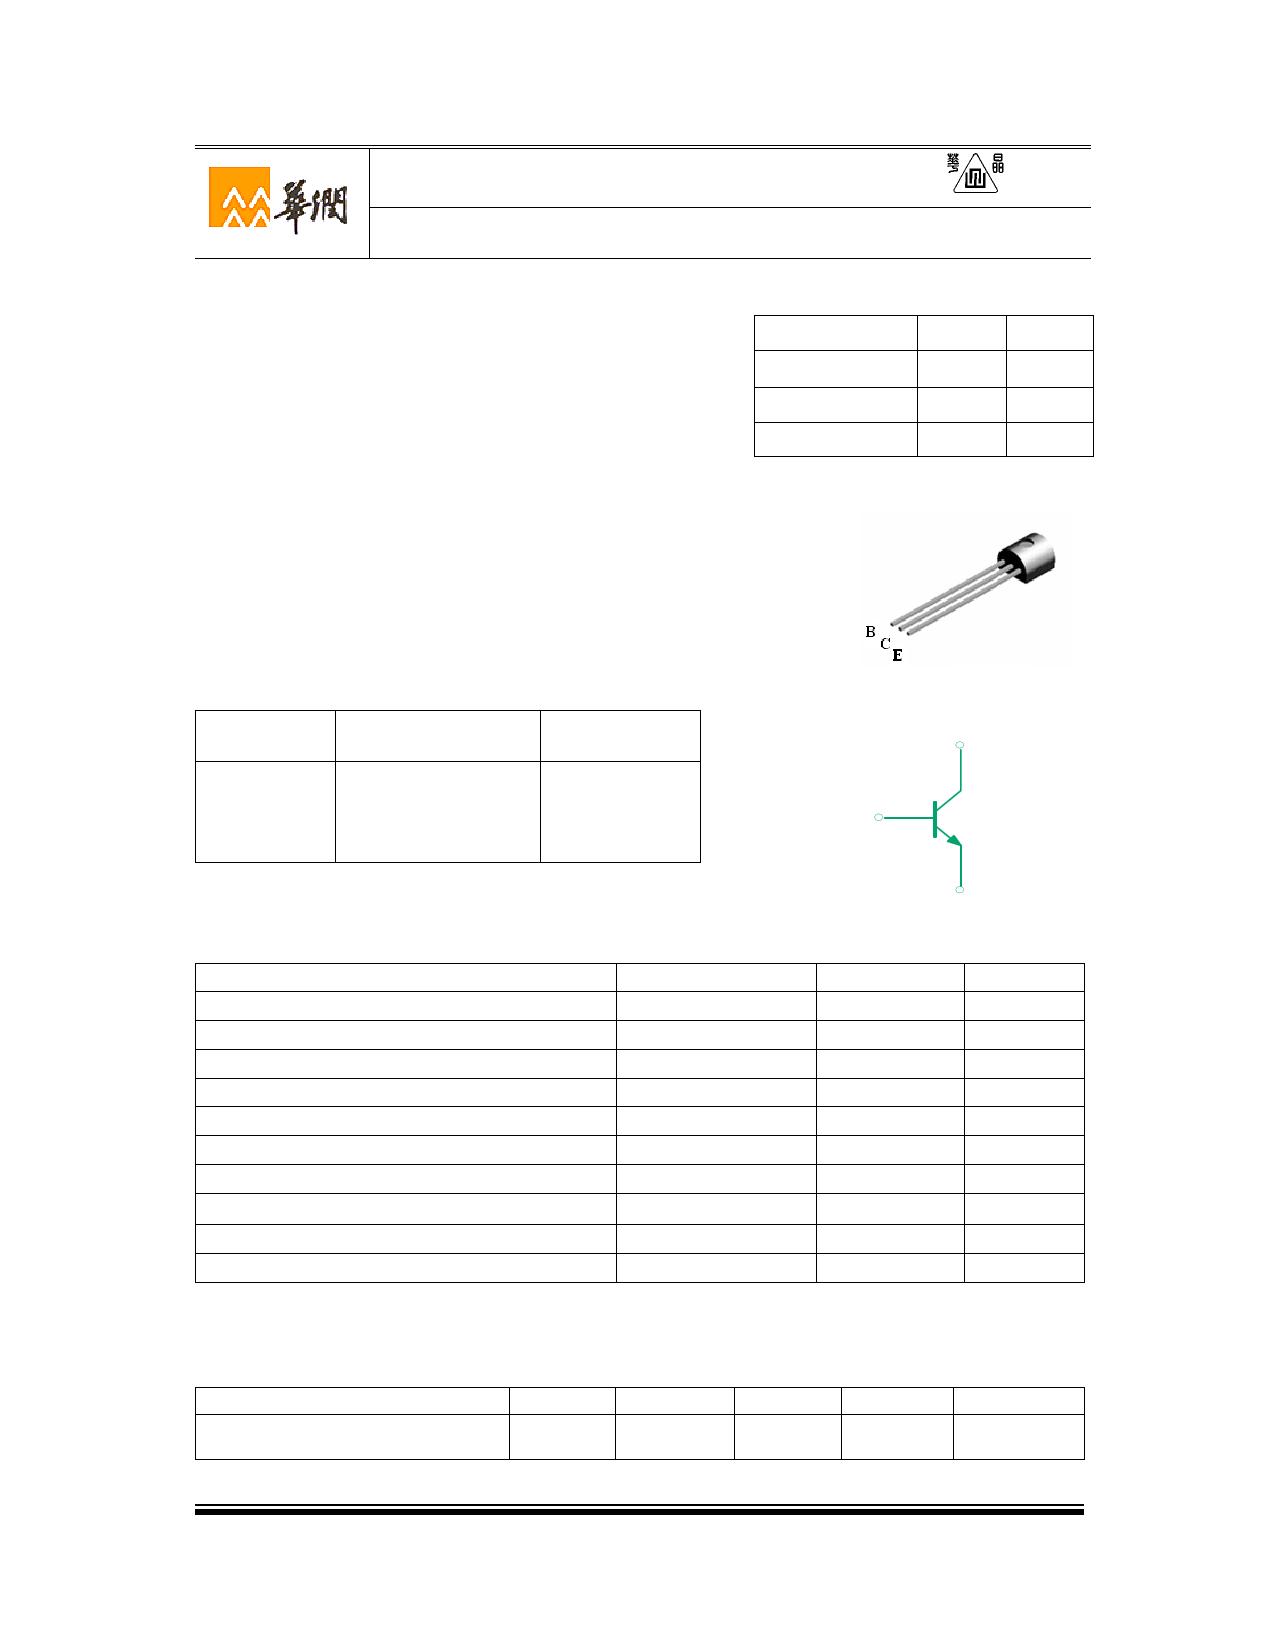 3DG2482S Datasheet, 3DG2482S PDF,ピン配置, 機能